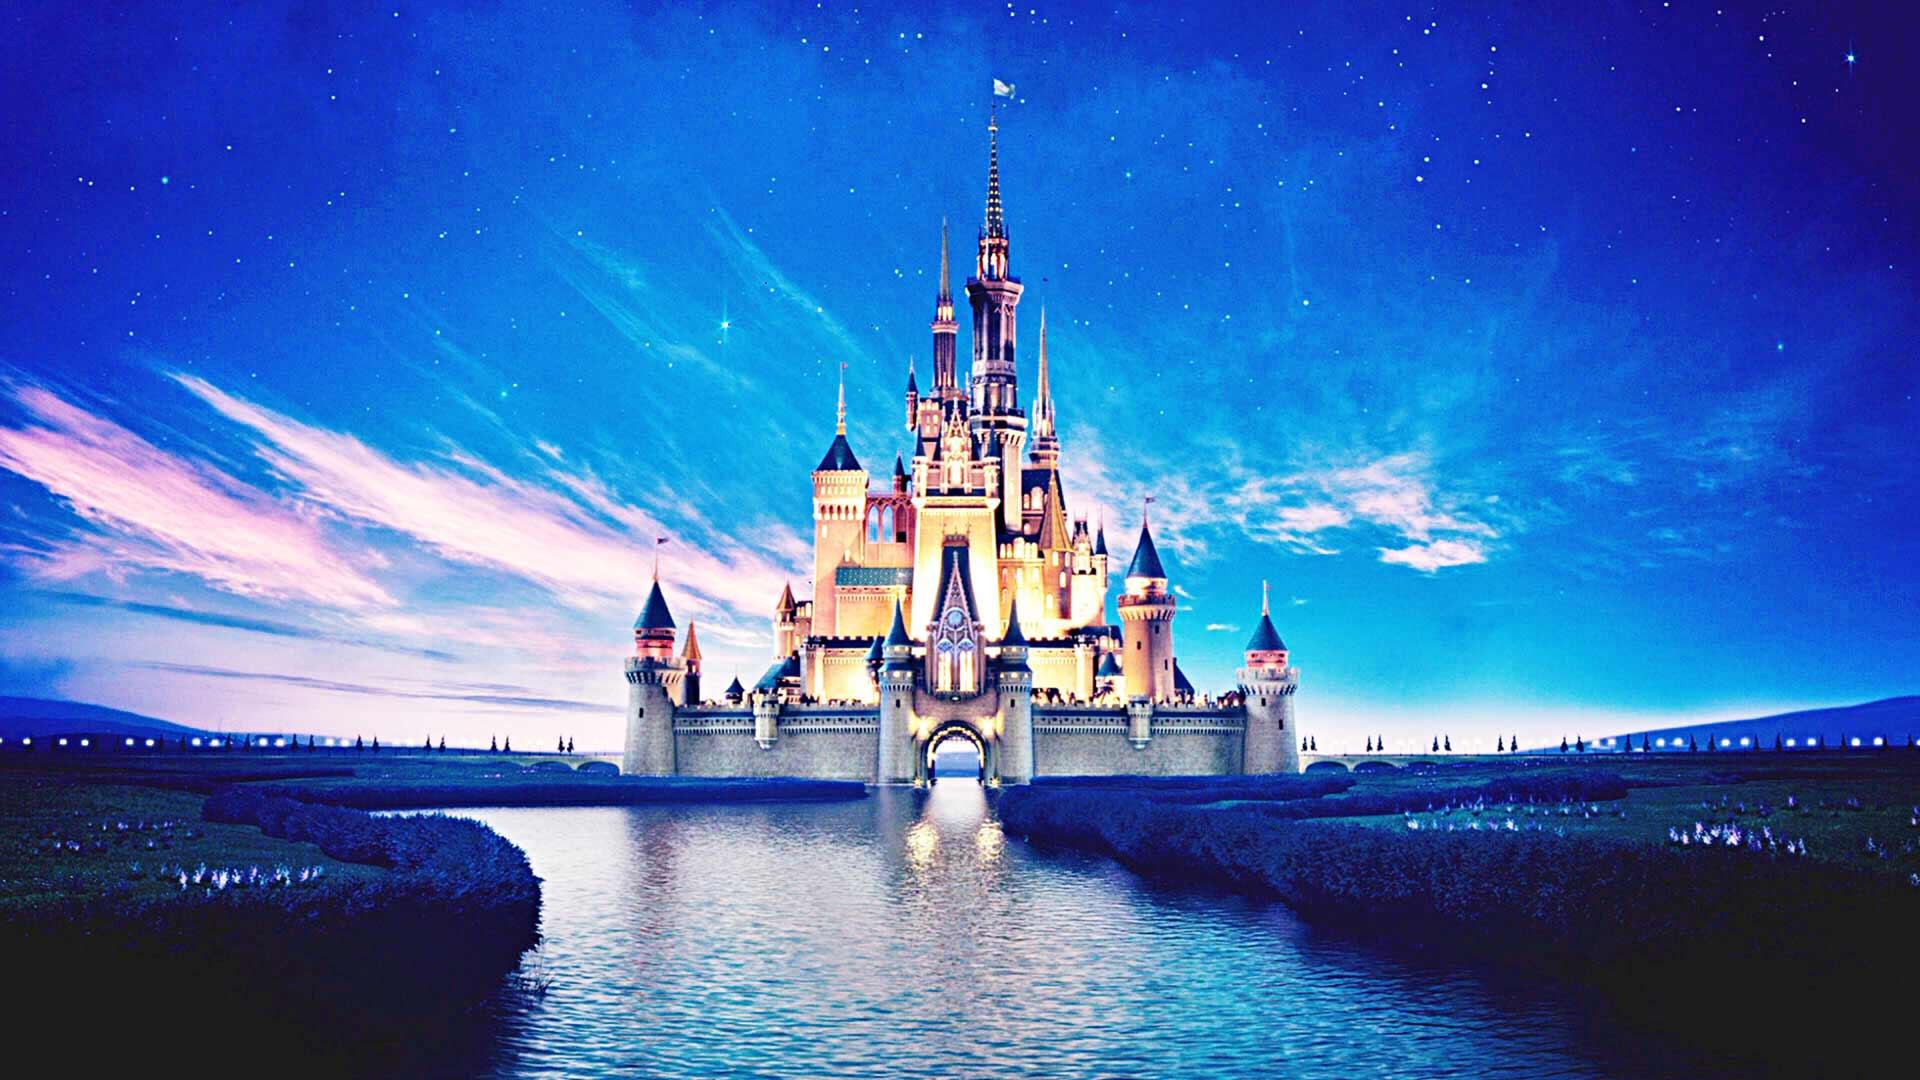 HD Disney Wallpaper